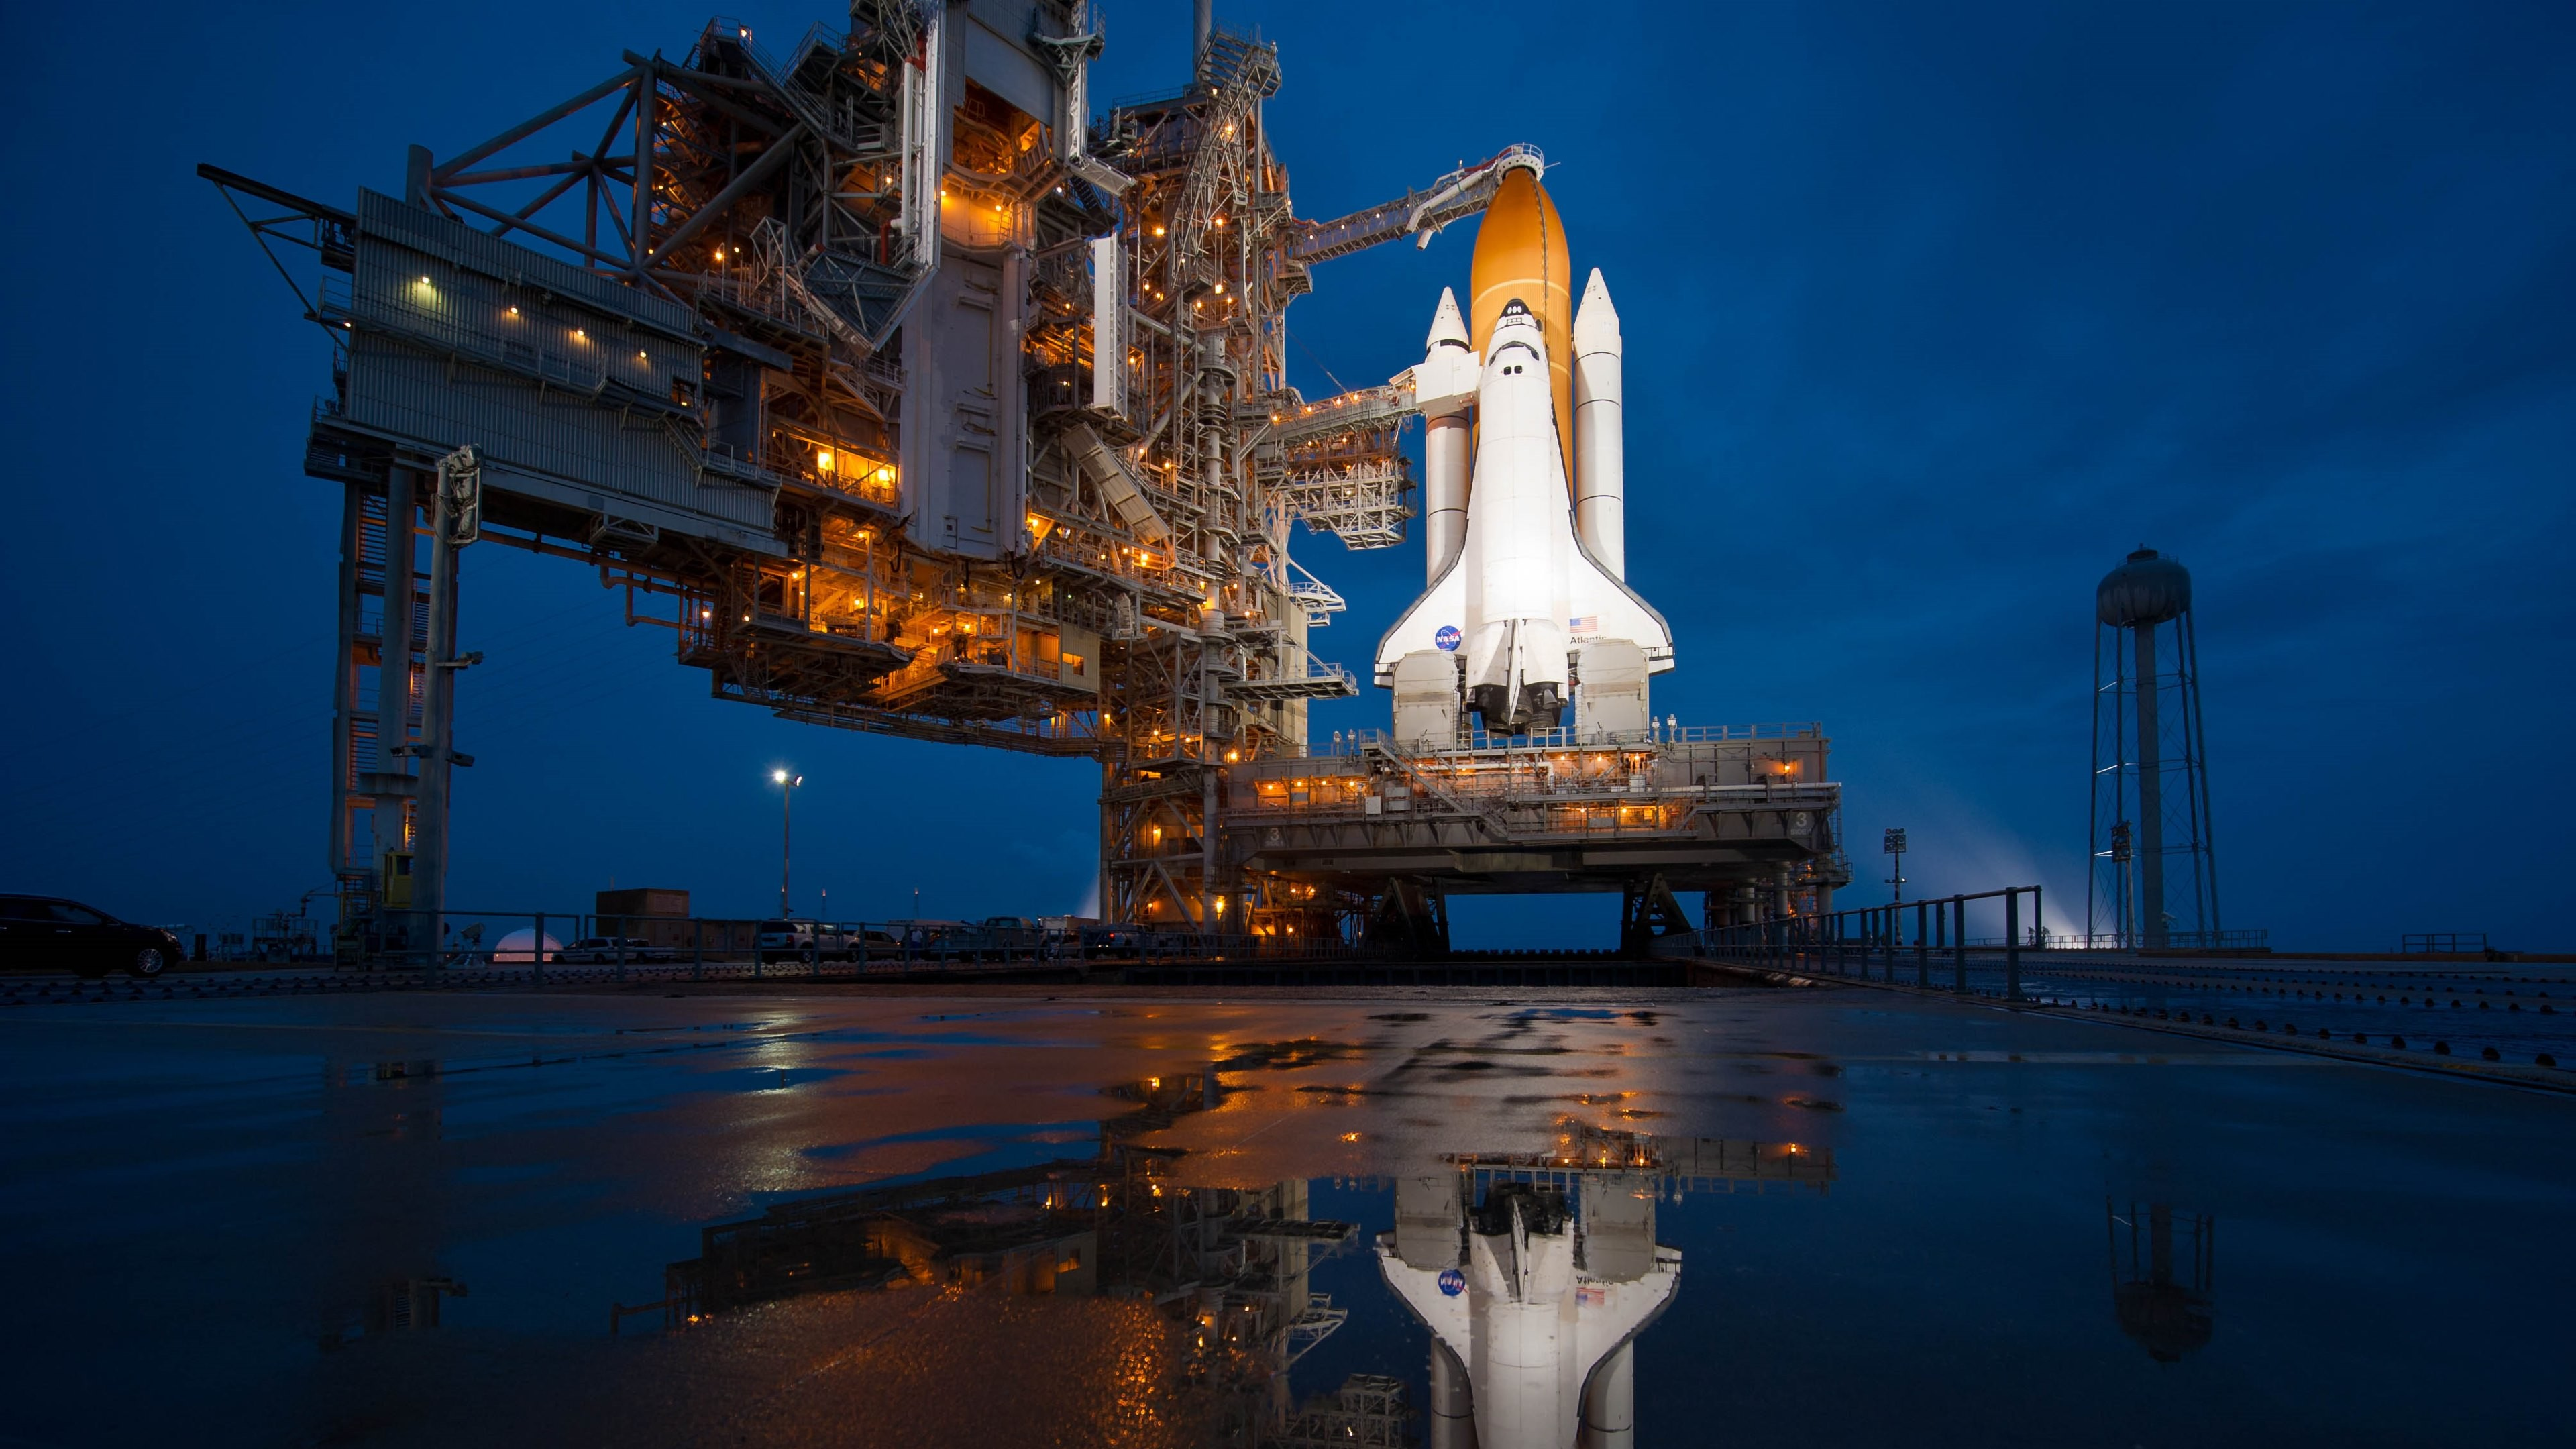 NASA Space Shuttles HD Wallpapers. 4K Wallpapers